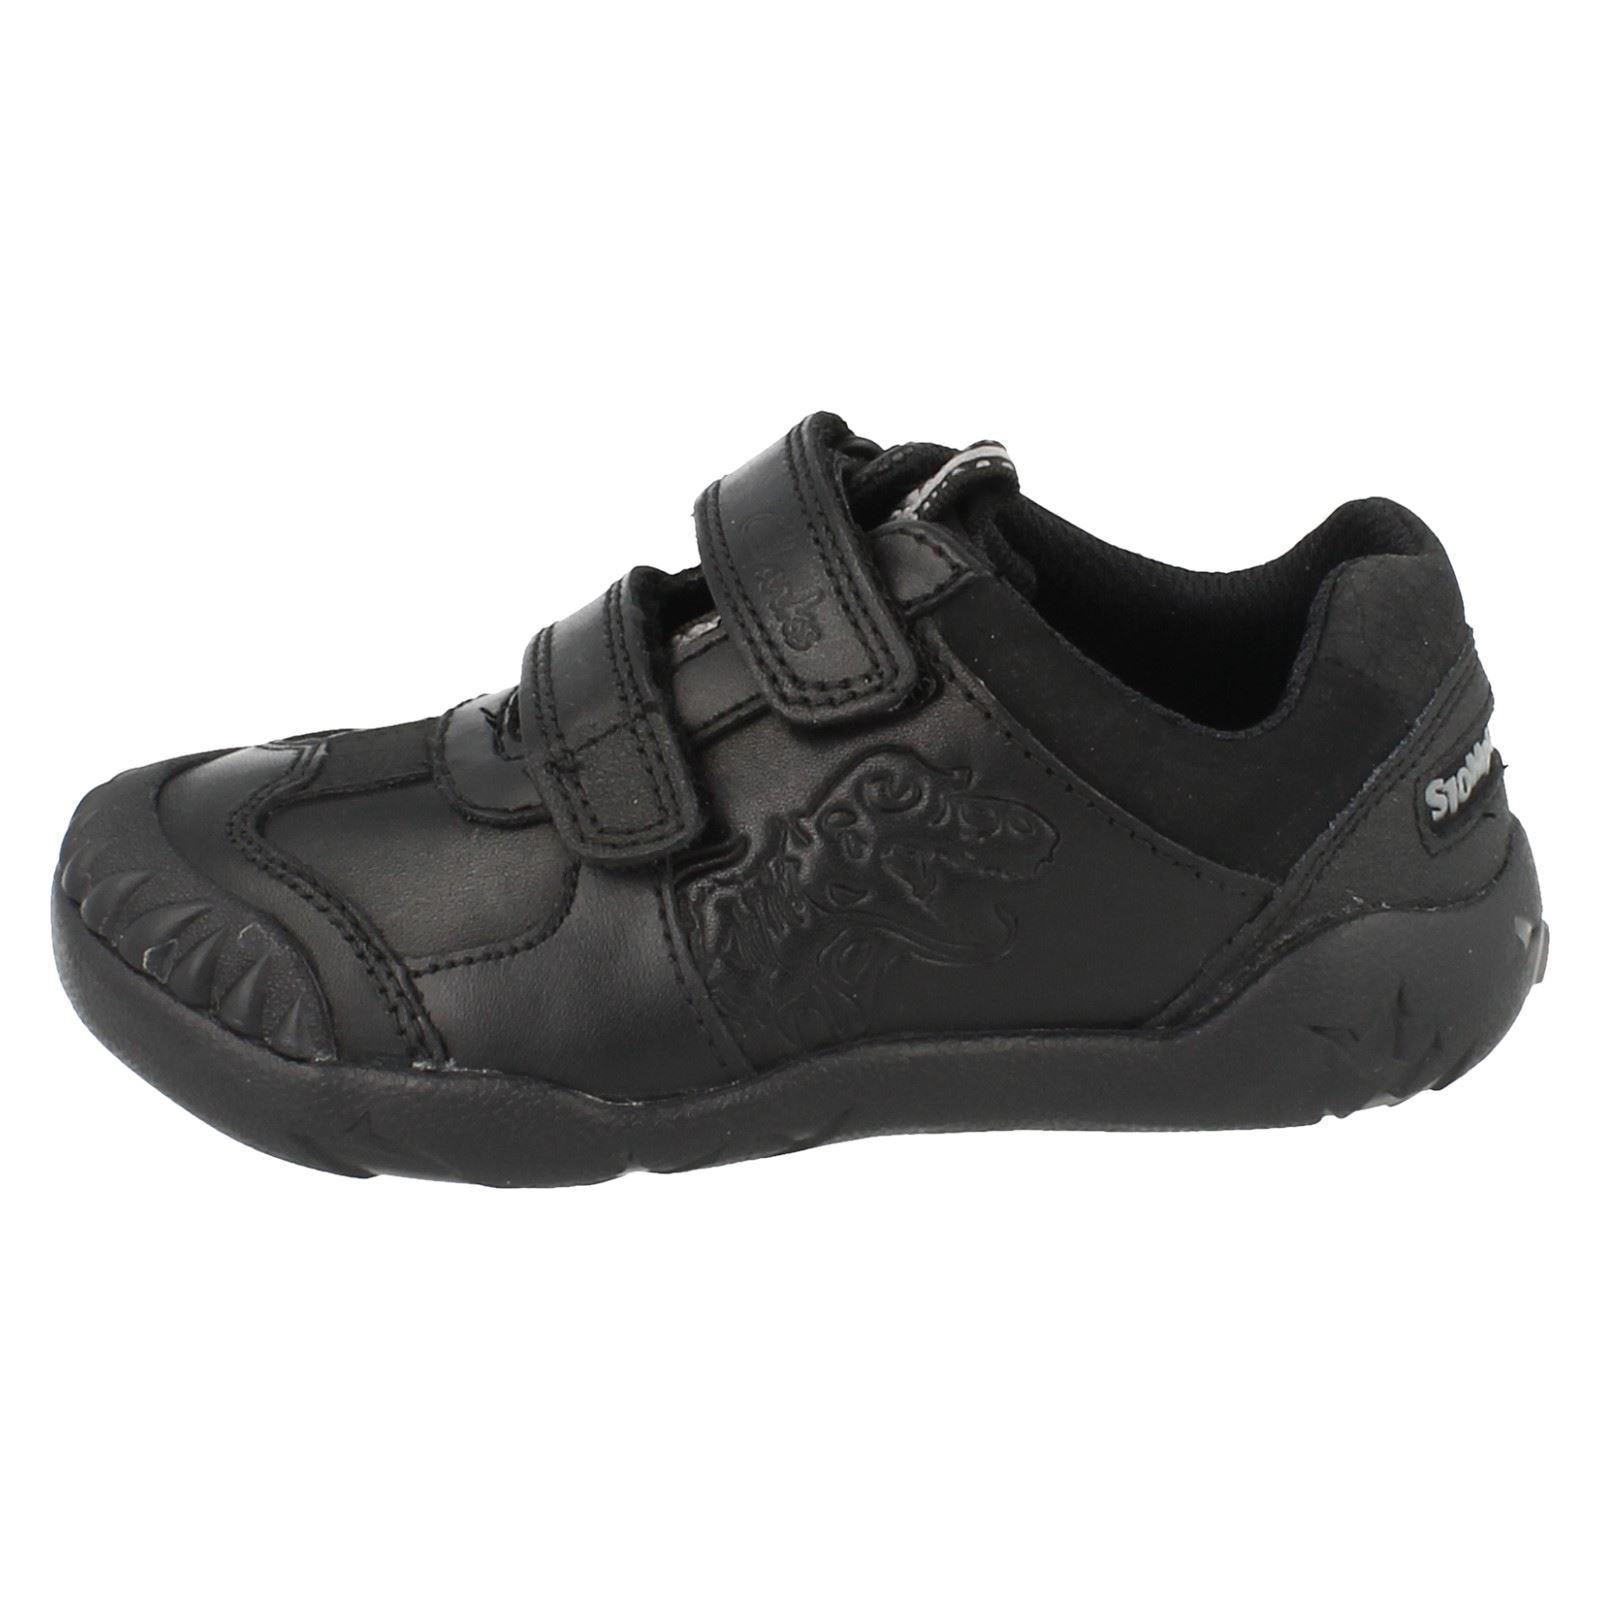 Boys Clarks Active Air Shoes